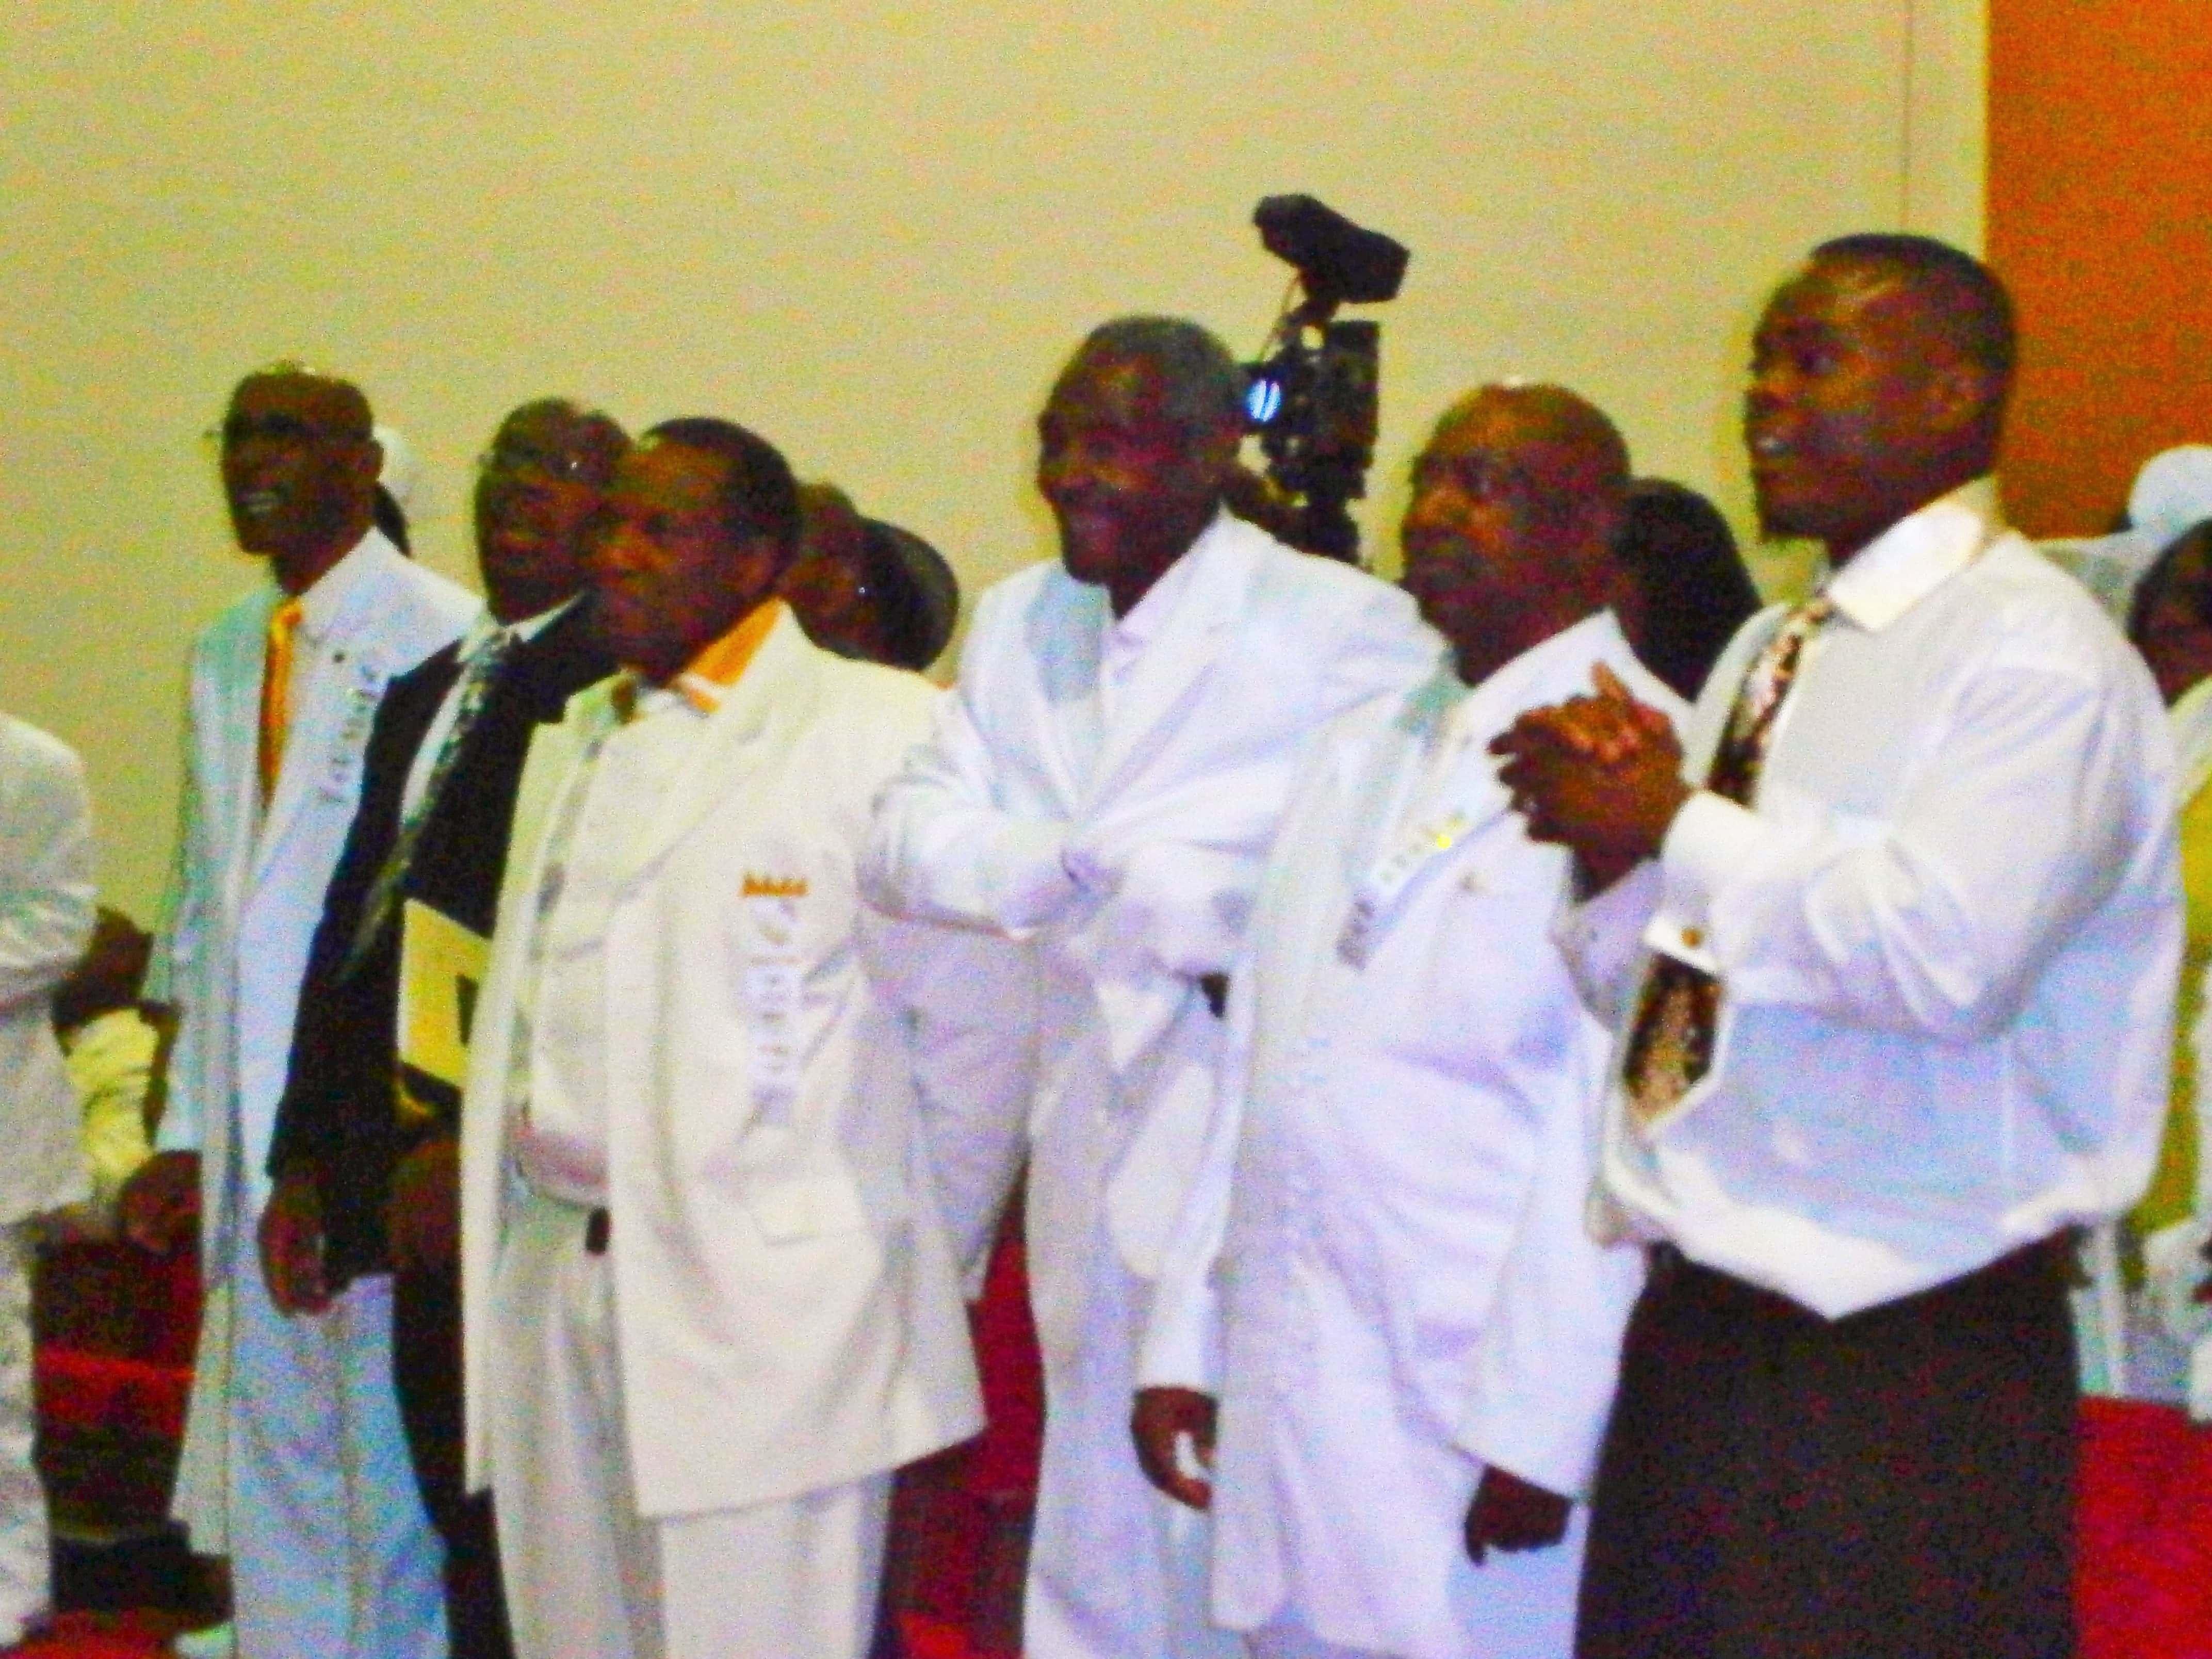 Church Pastors and Bishops